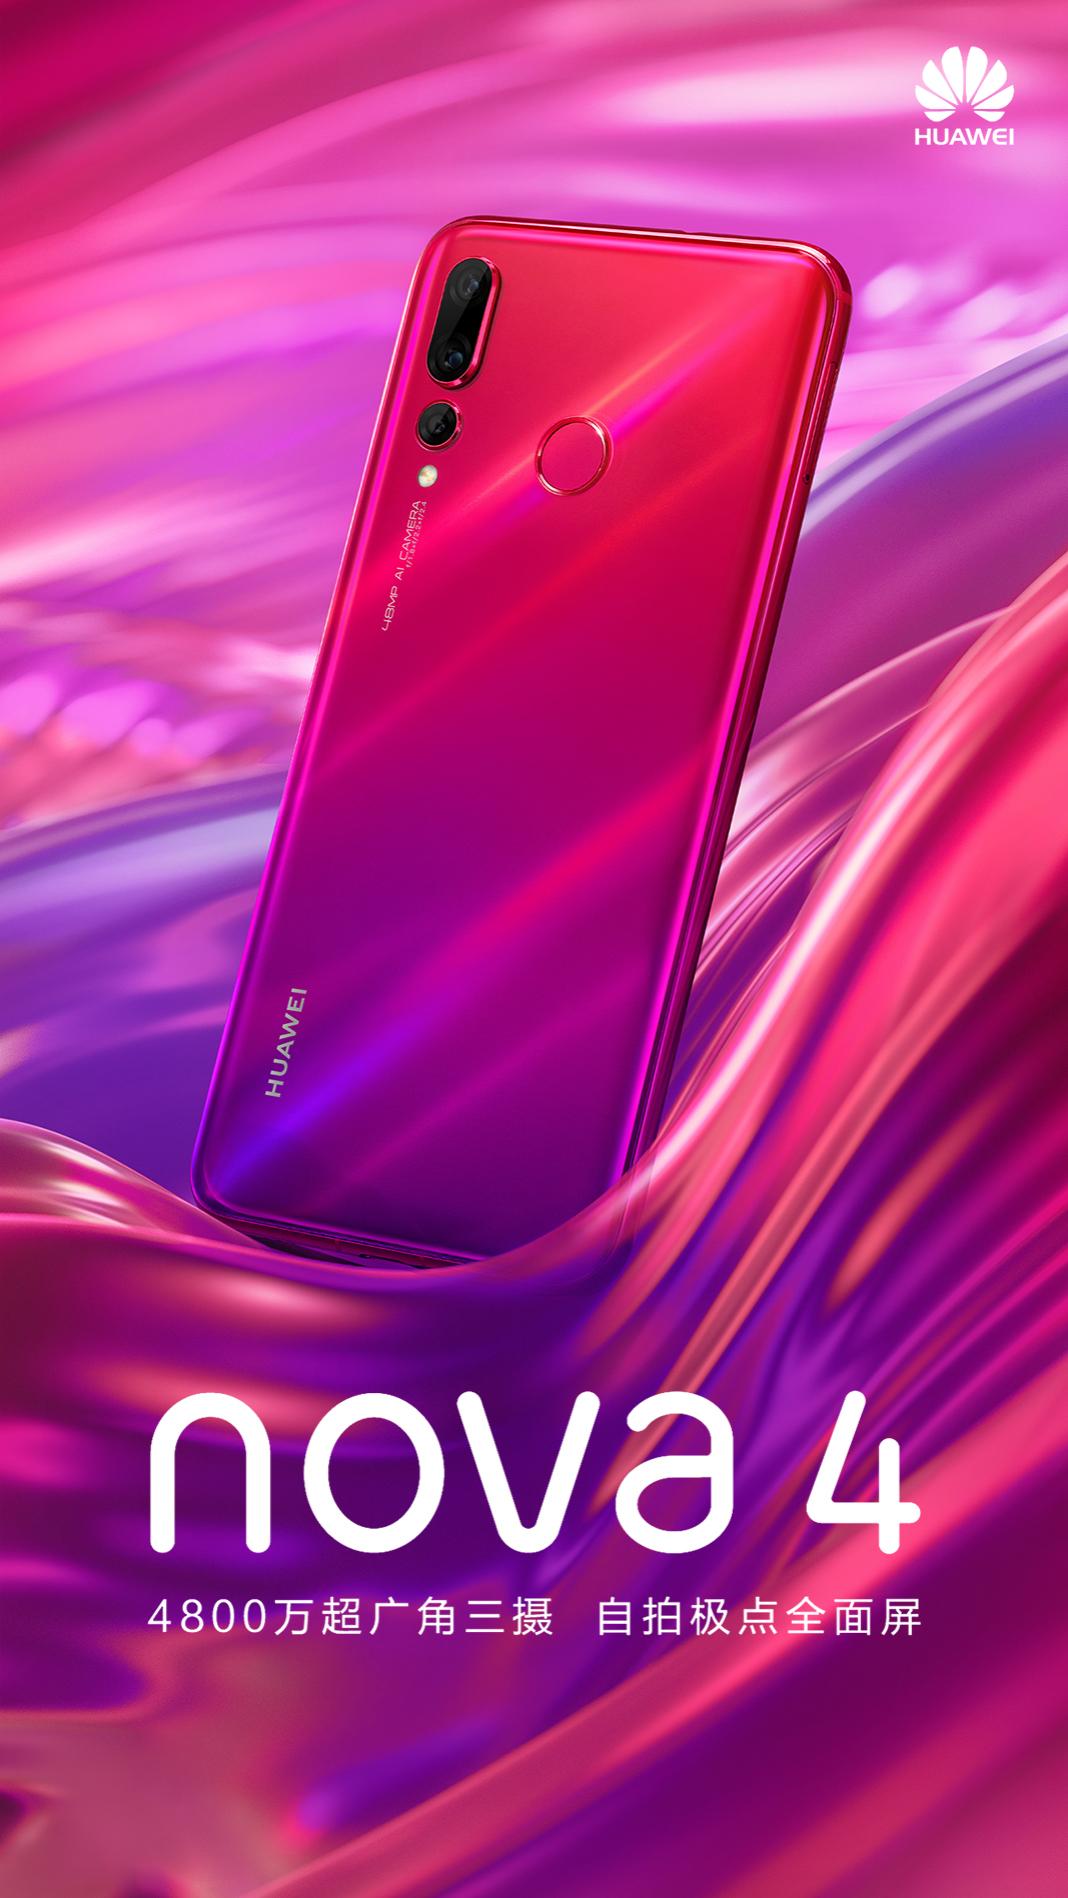 Huawei Venice_ID_V